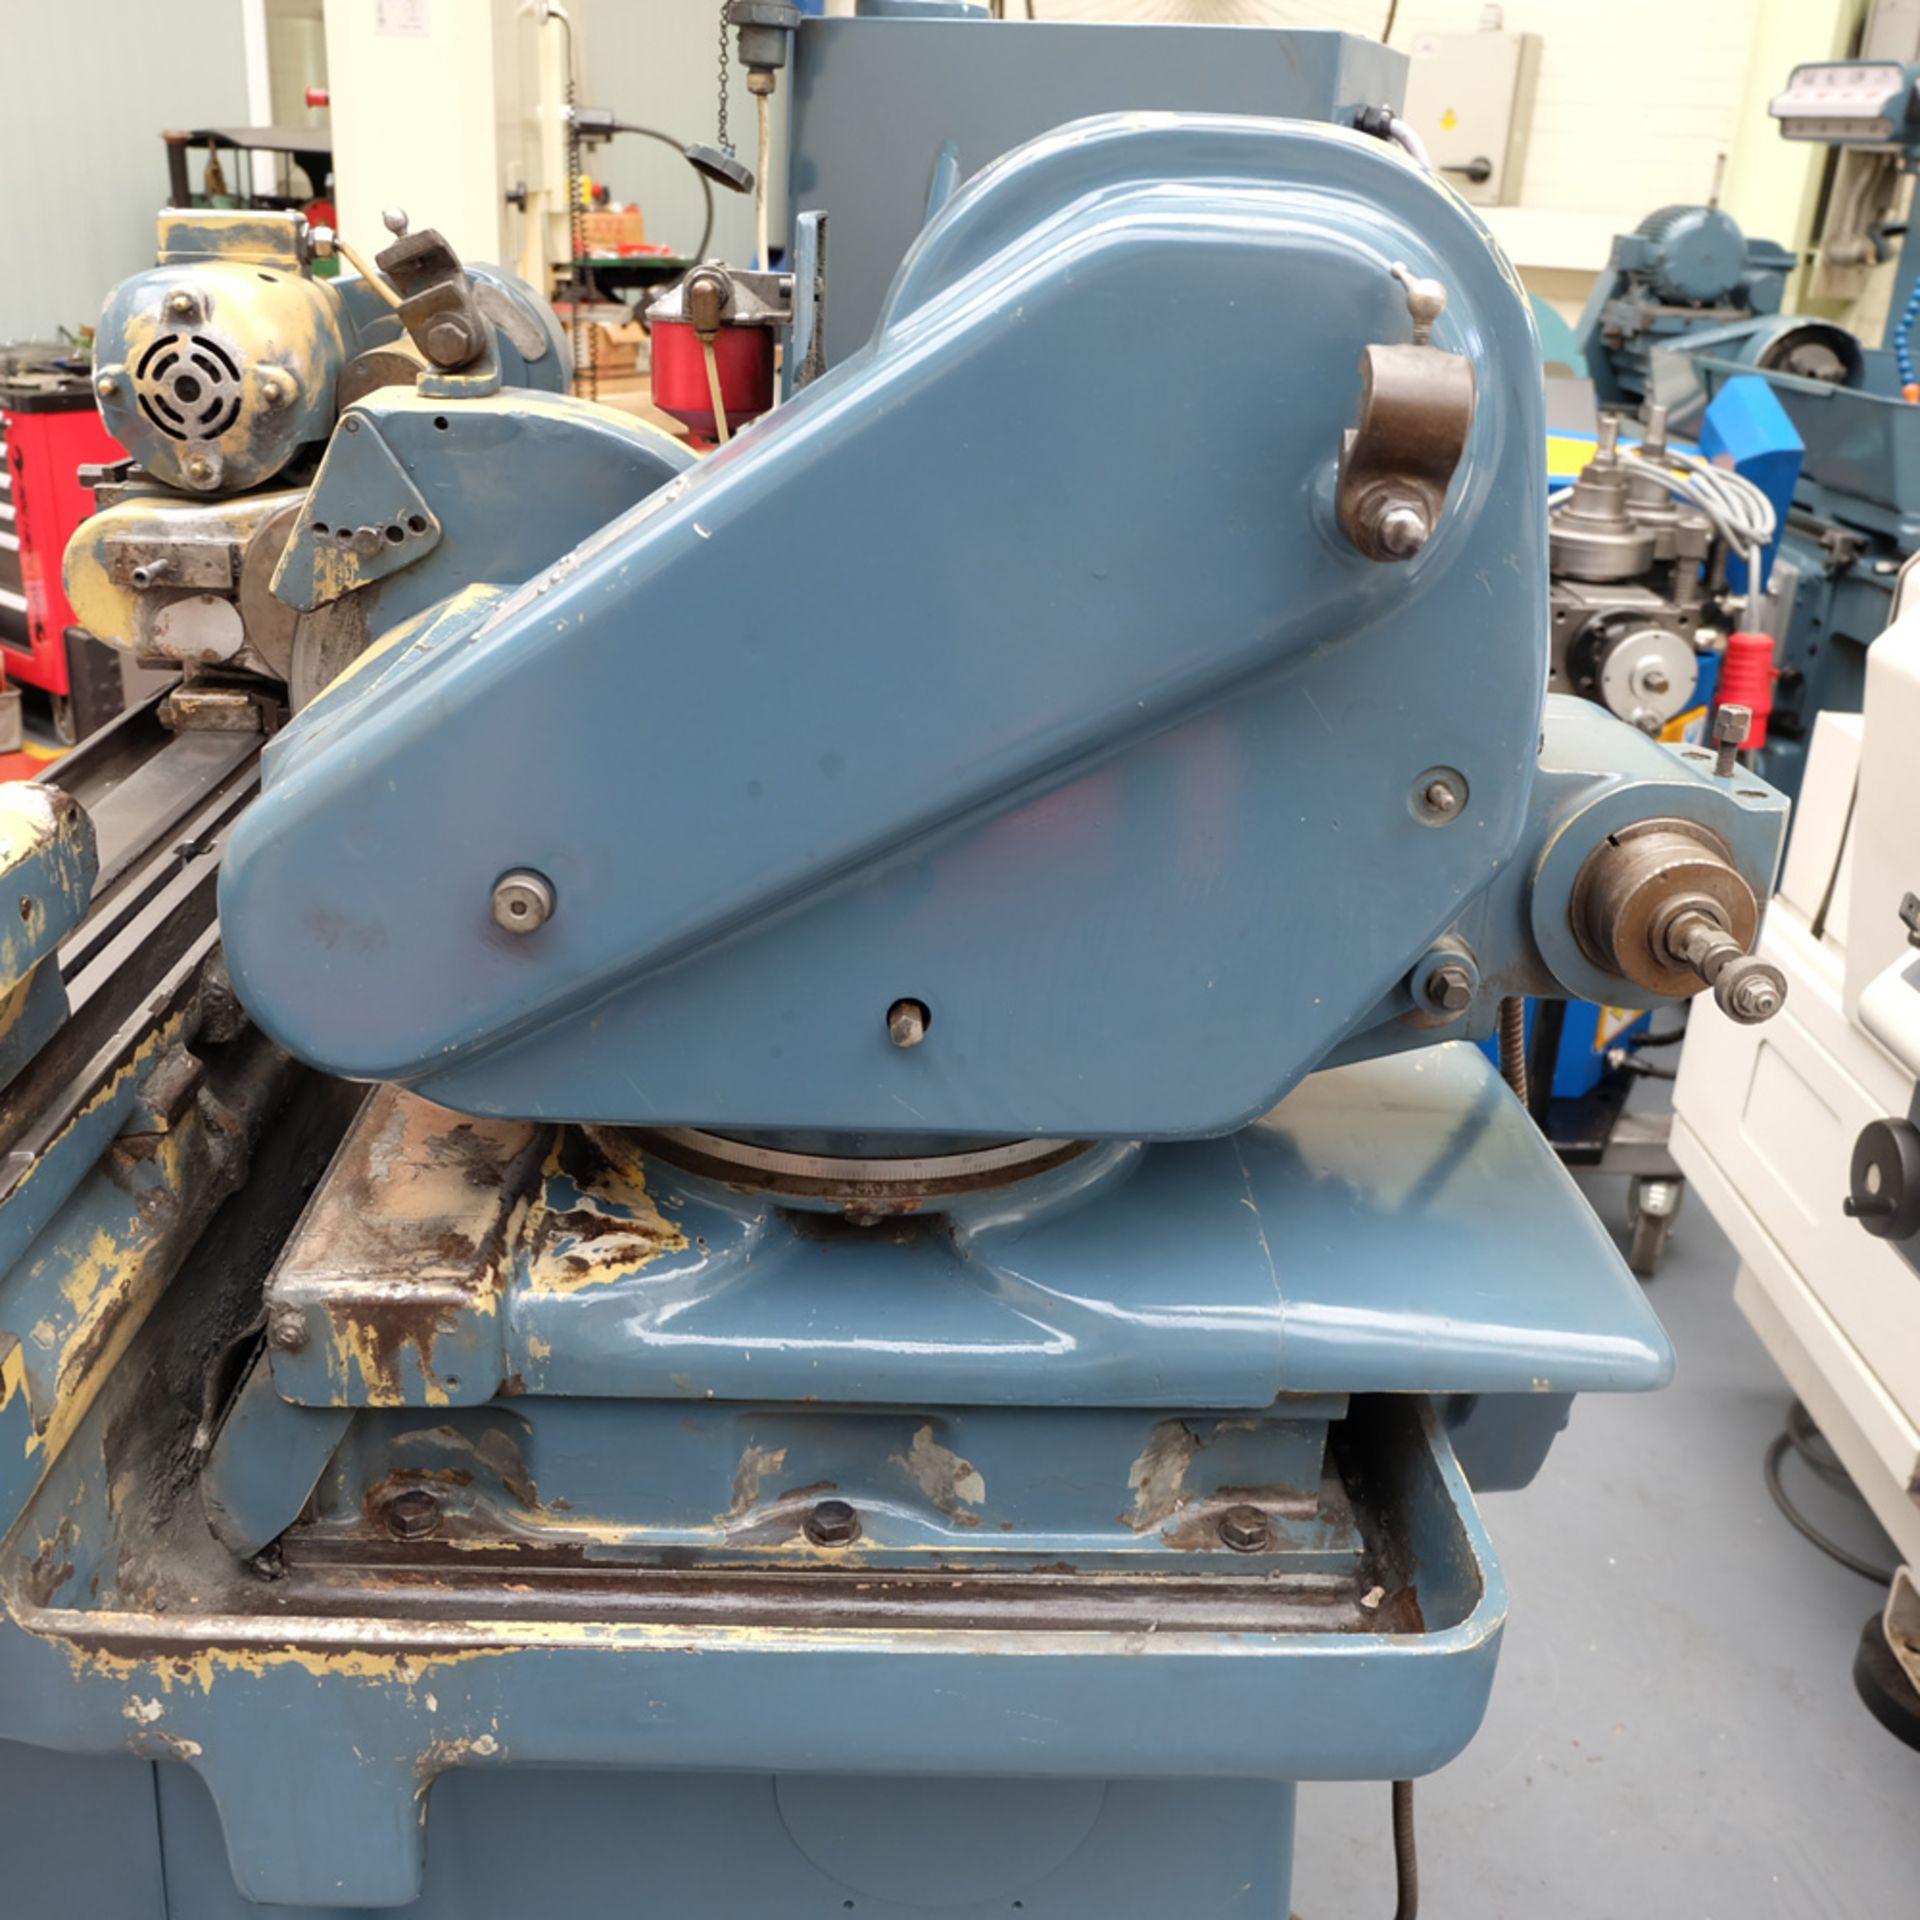 "Jones & Shipman Model 1310 EIU Universal Cylindrical Grinder. Capacity 18"" x 8"". - Image 6 of 11"